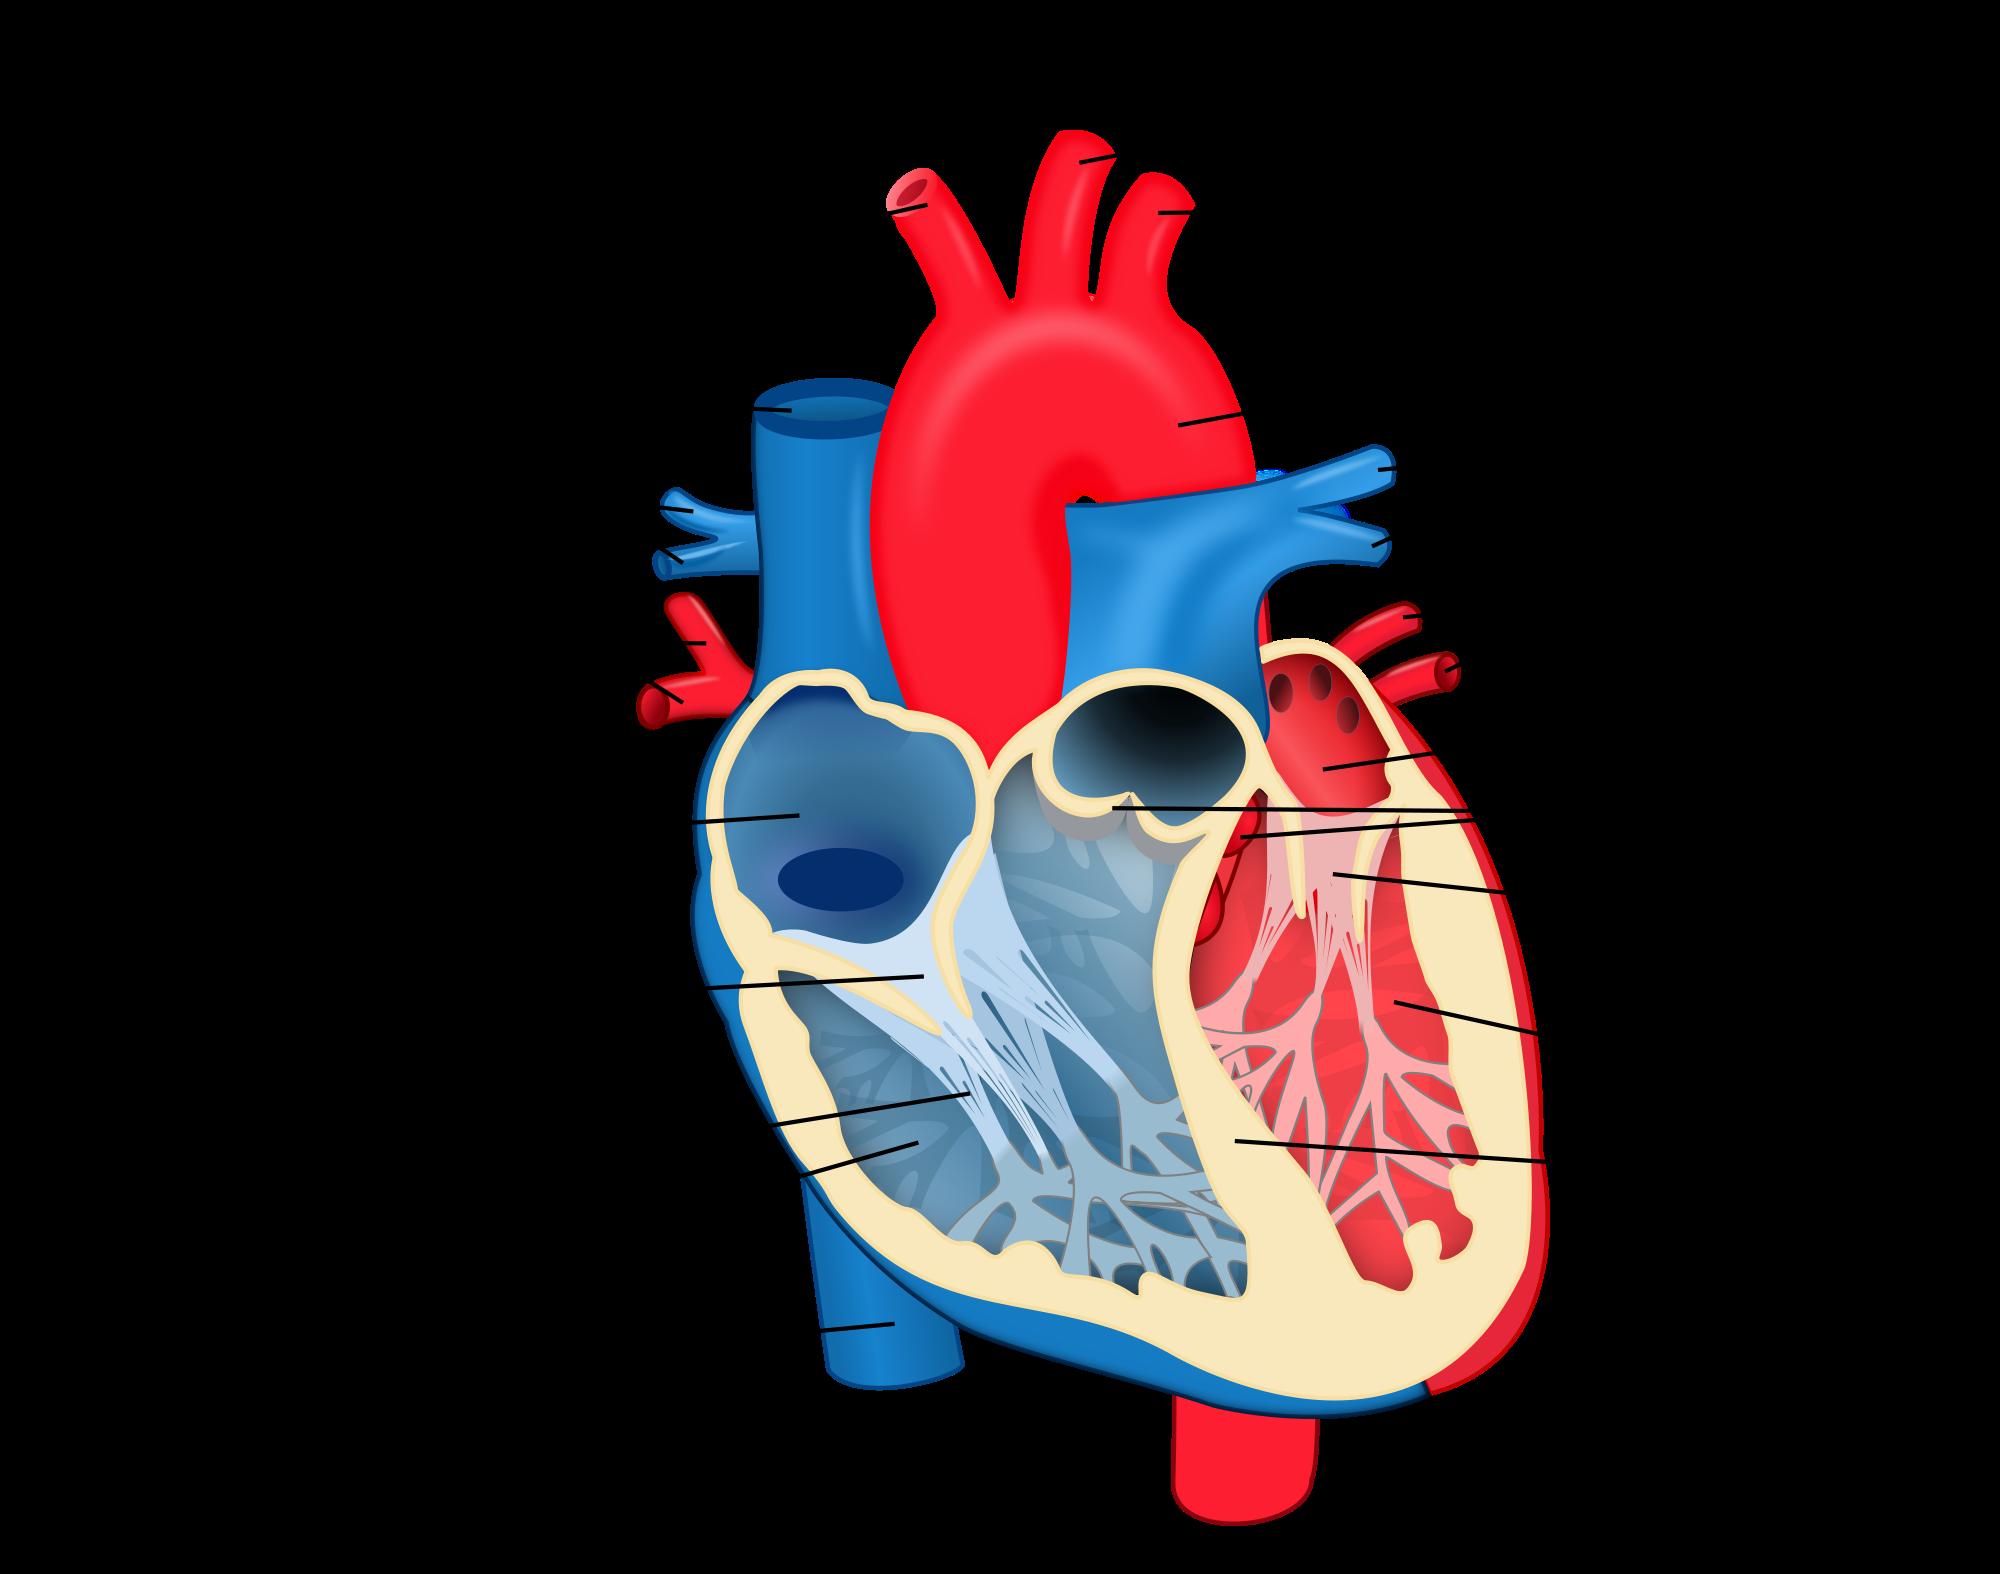 Structural diagram of the human heart an organ that provides a structural diagram of the human heart an organ that provides a continuous blood circulation through pooptronica